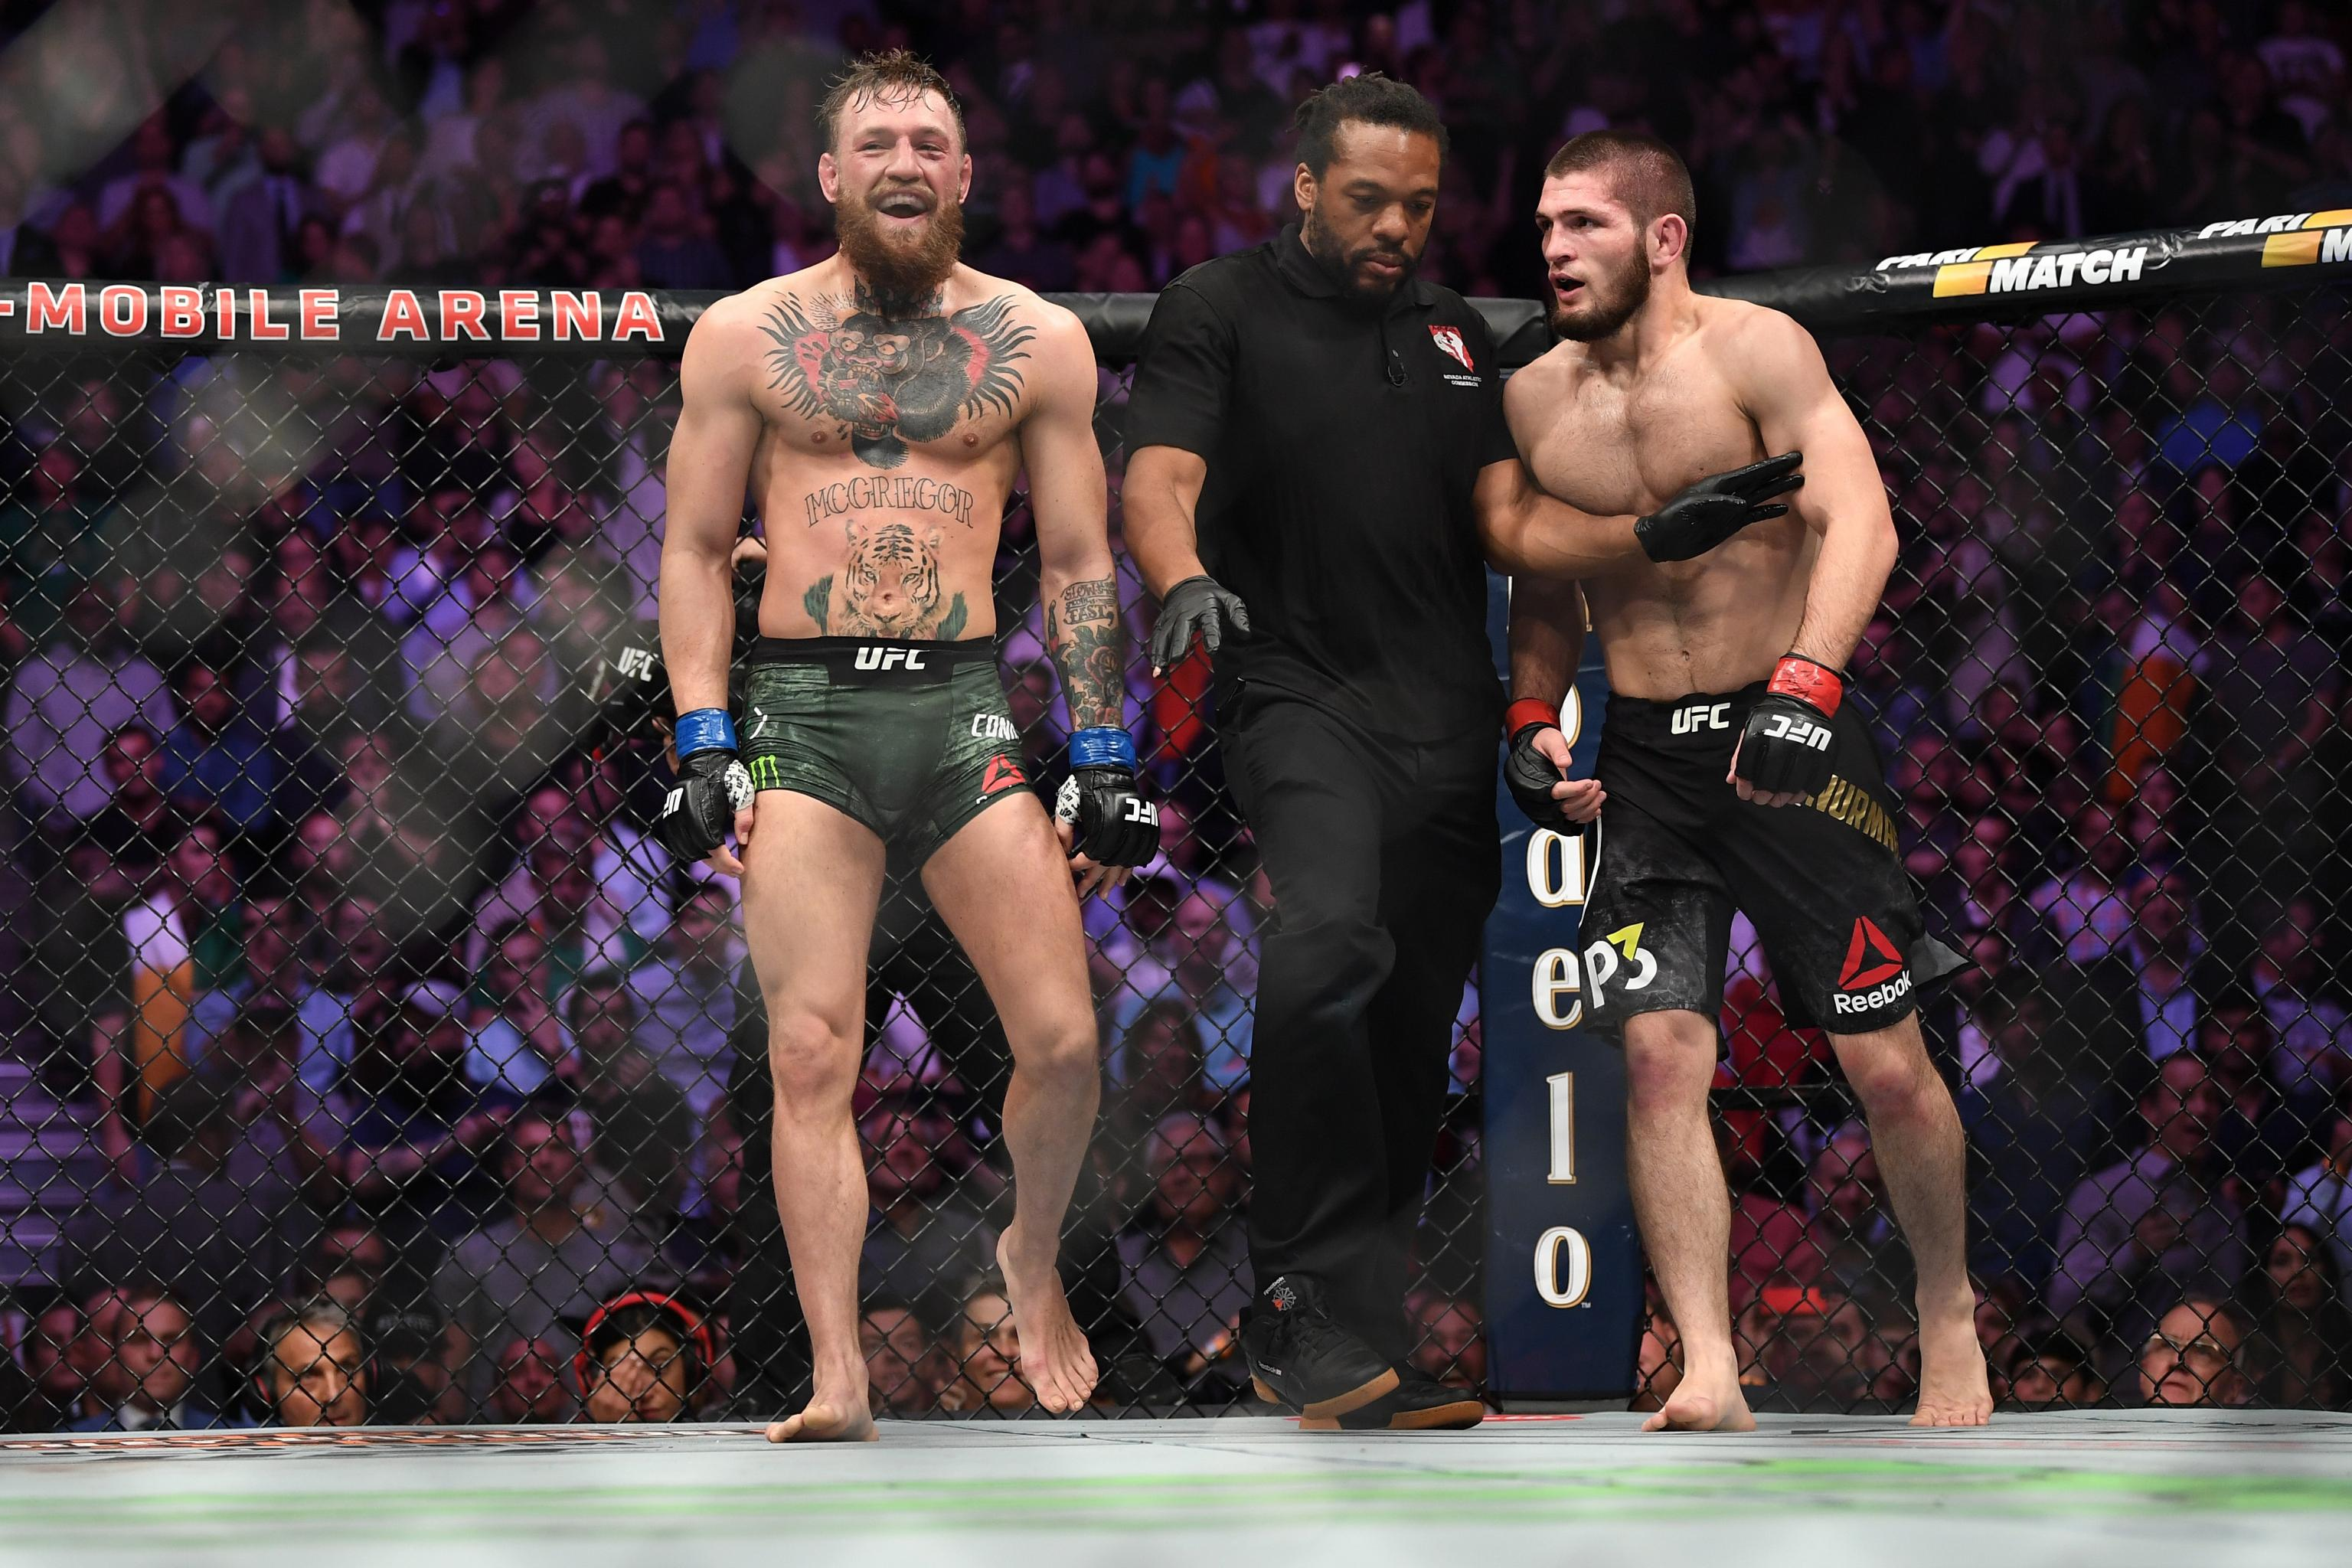 video review : Khabib Nurmagomedov versus Conor McGregor at UFC 229